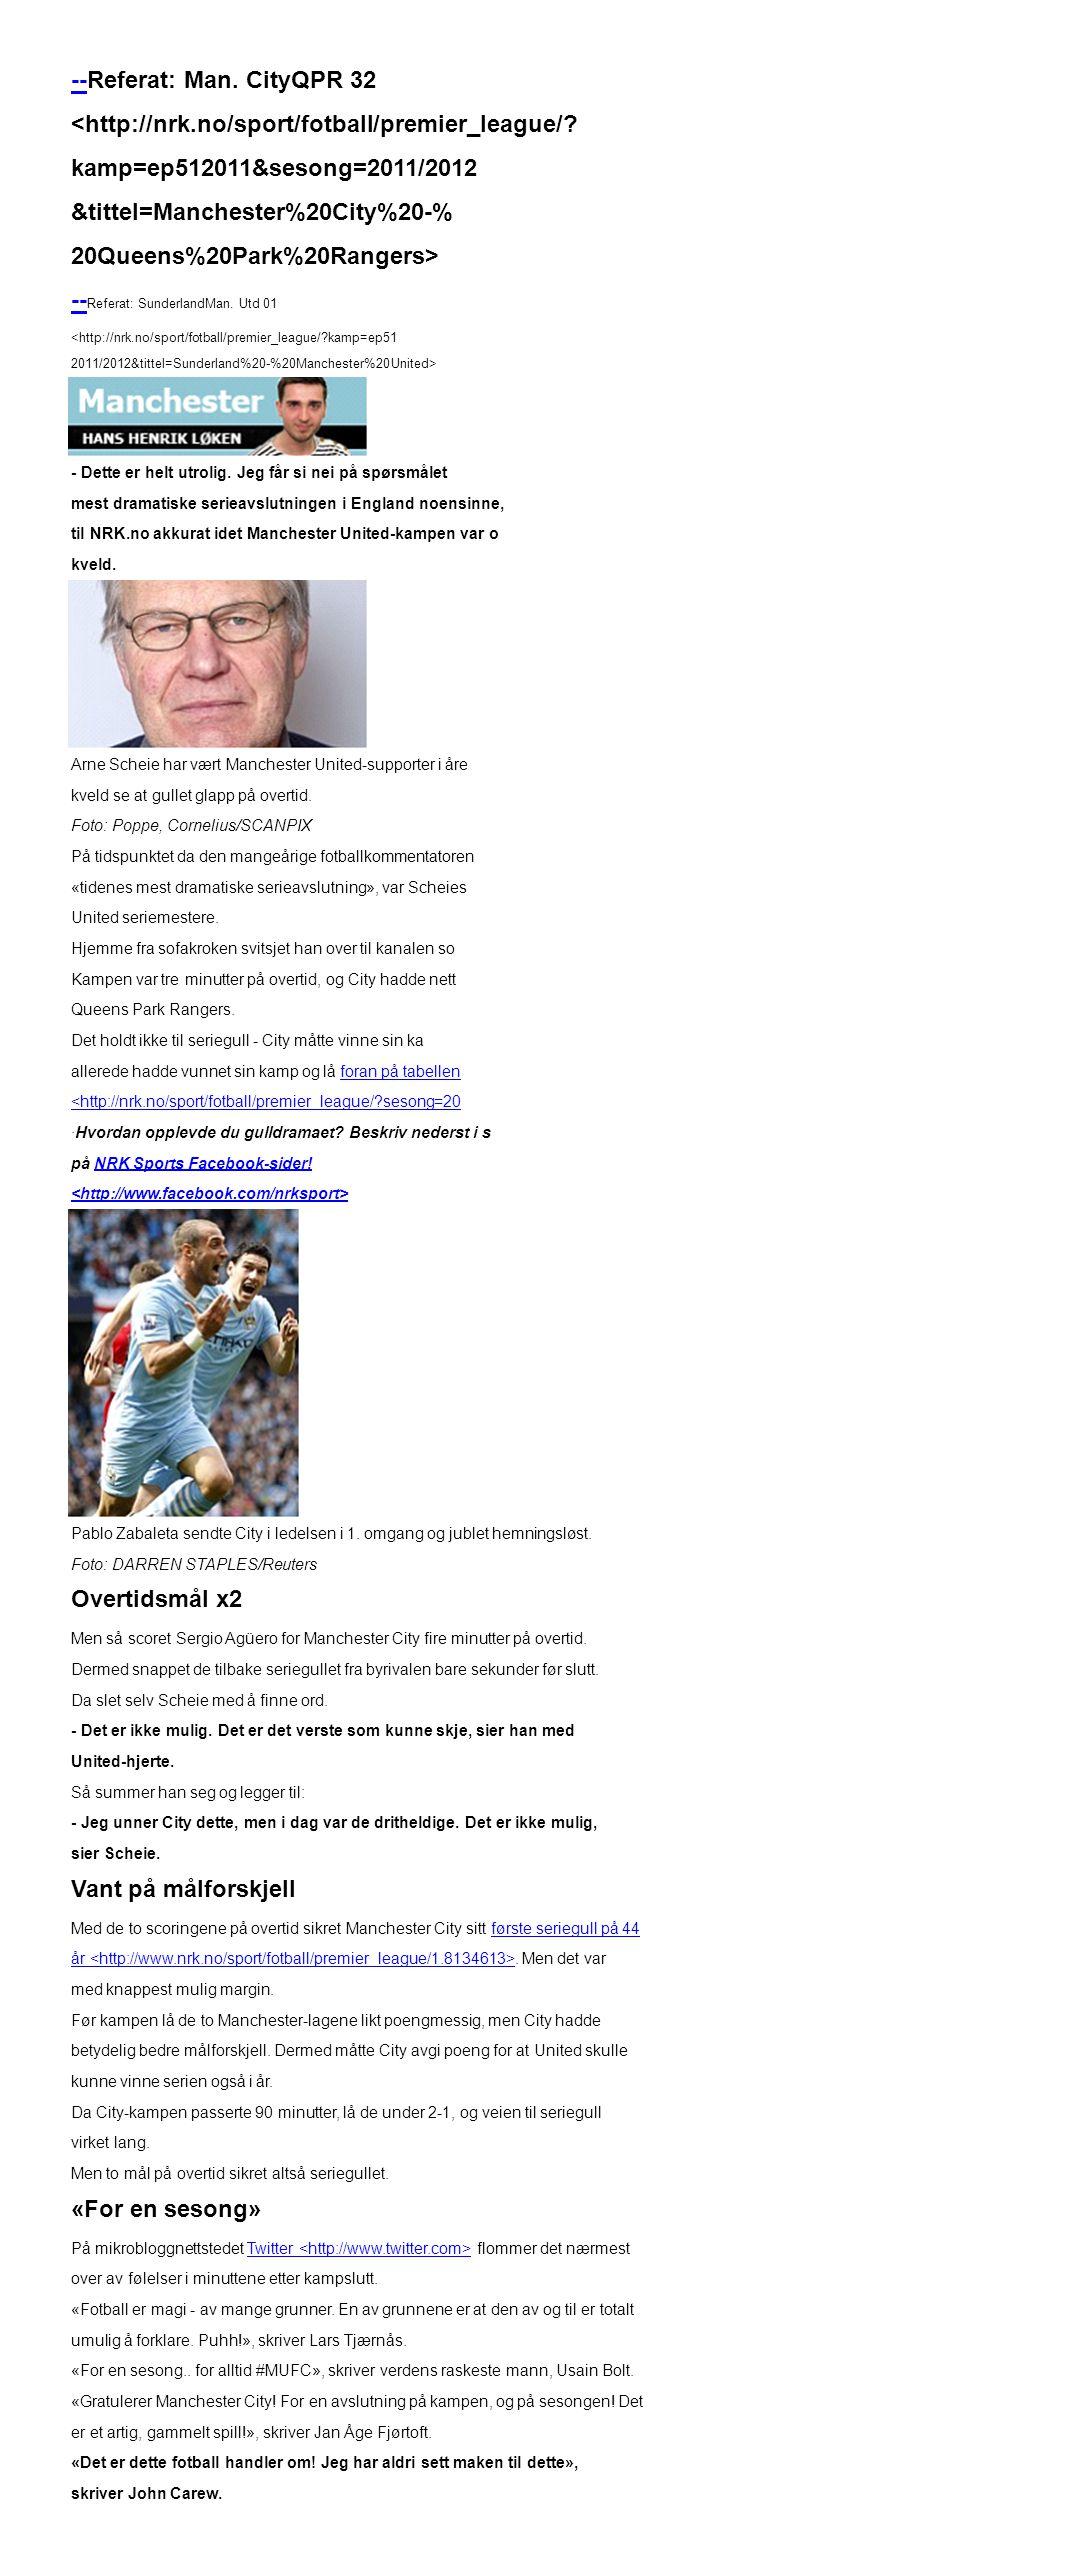 --Referat: Man. CityQPR 32 <http://nrk.no/sport/fotball/premier_league/? kamp=ep512011&sesong=2011/2012 &tittel=Manchester%20City%20-% 20Queens%20Park